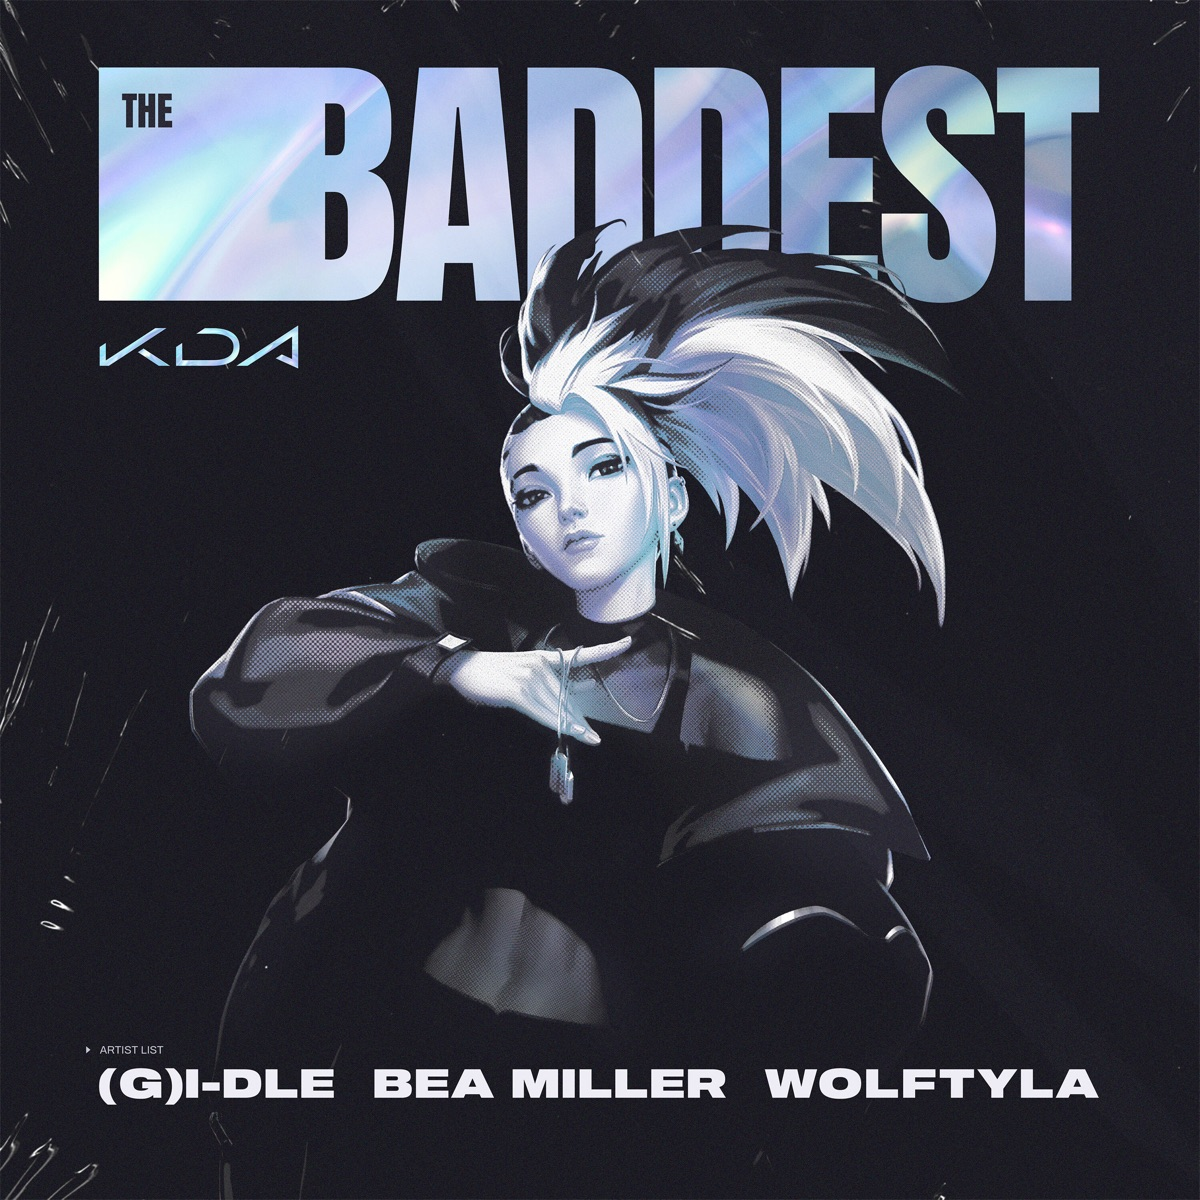 『K/DA - THE BADDEST 歌詞』収録の『THE BADDEST』ジャケット